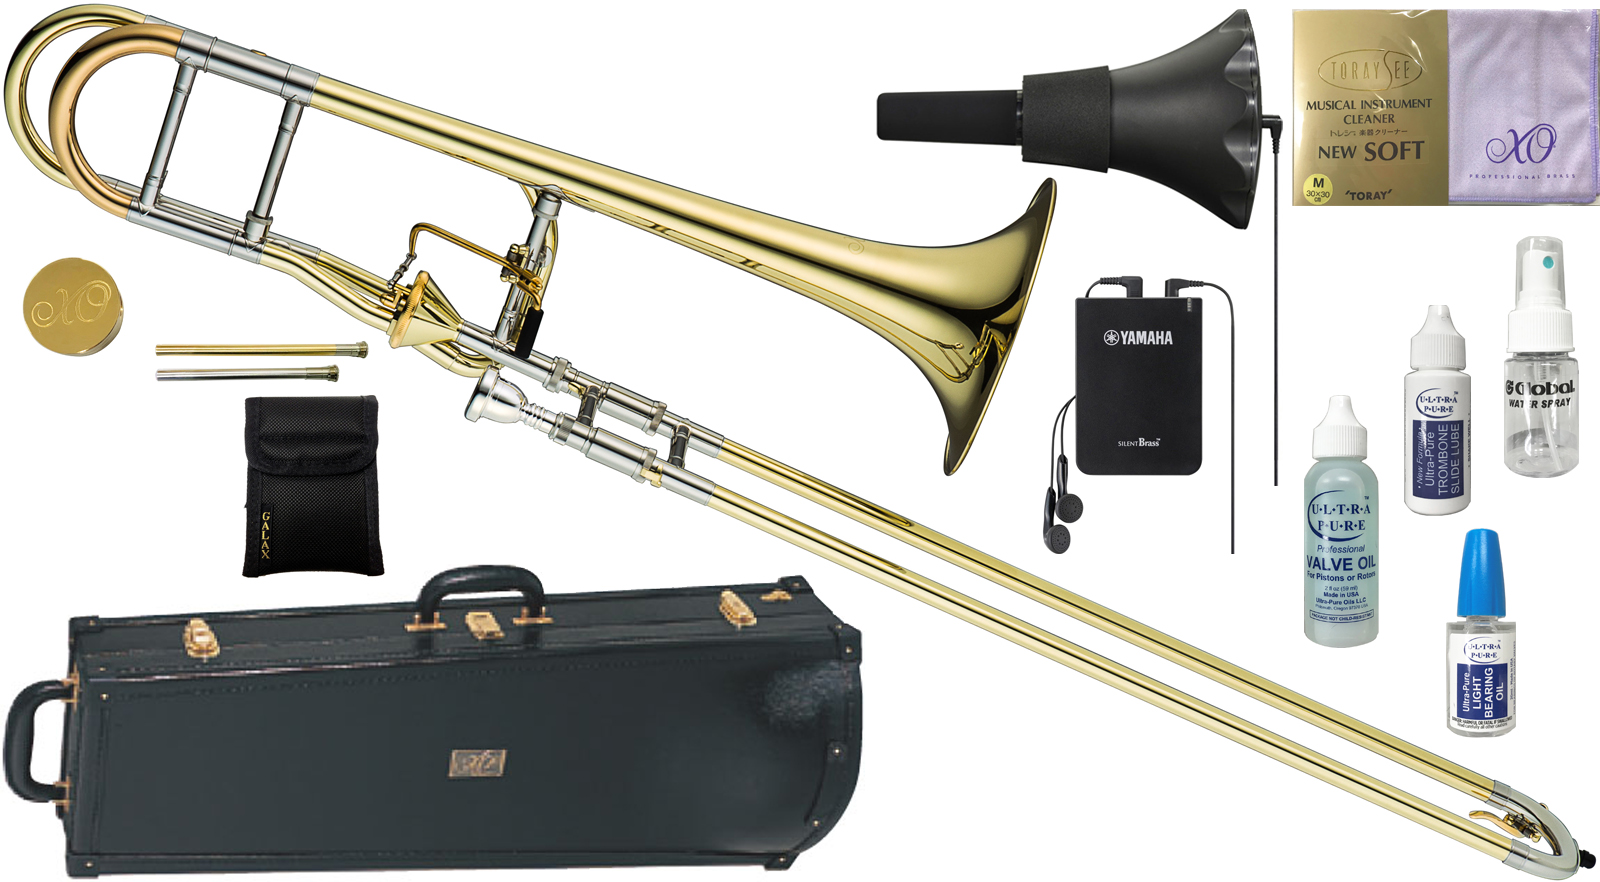 XO ( エックスオー ) 1236L-T トロンボーン 新品 B♭/F管 テナーバストロンボーン アキシャルフローバルブ イエローブラス 太管 Tenor Bass Trombones BT-L セットB 送料無料